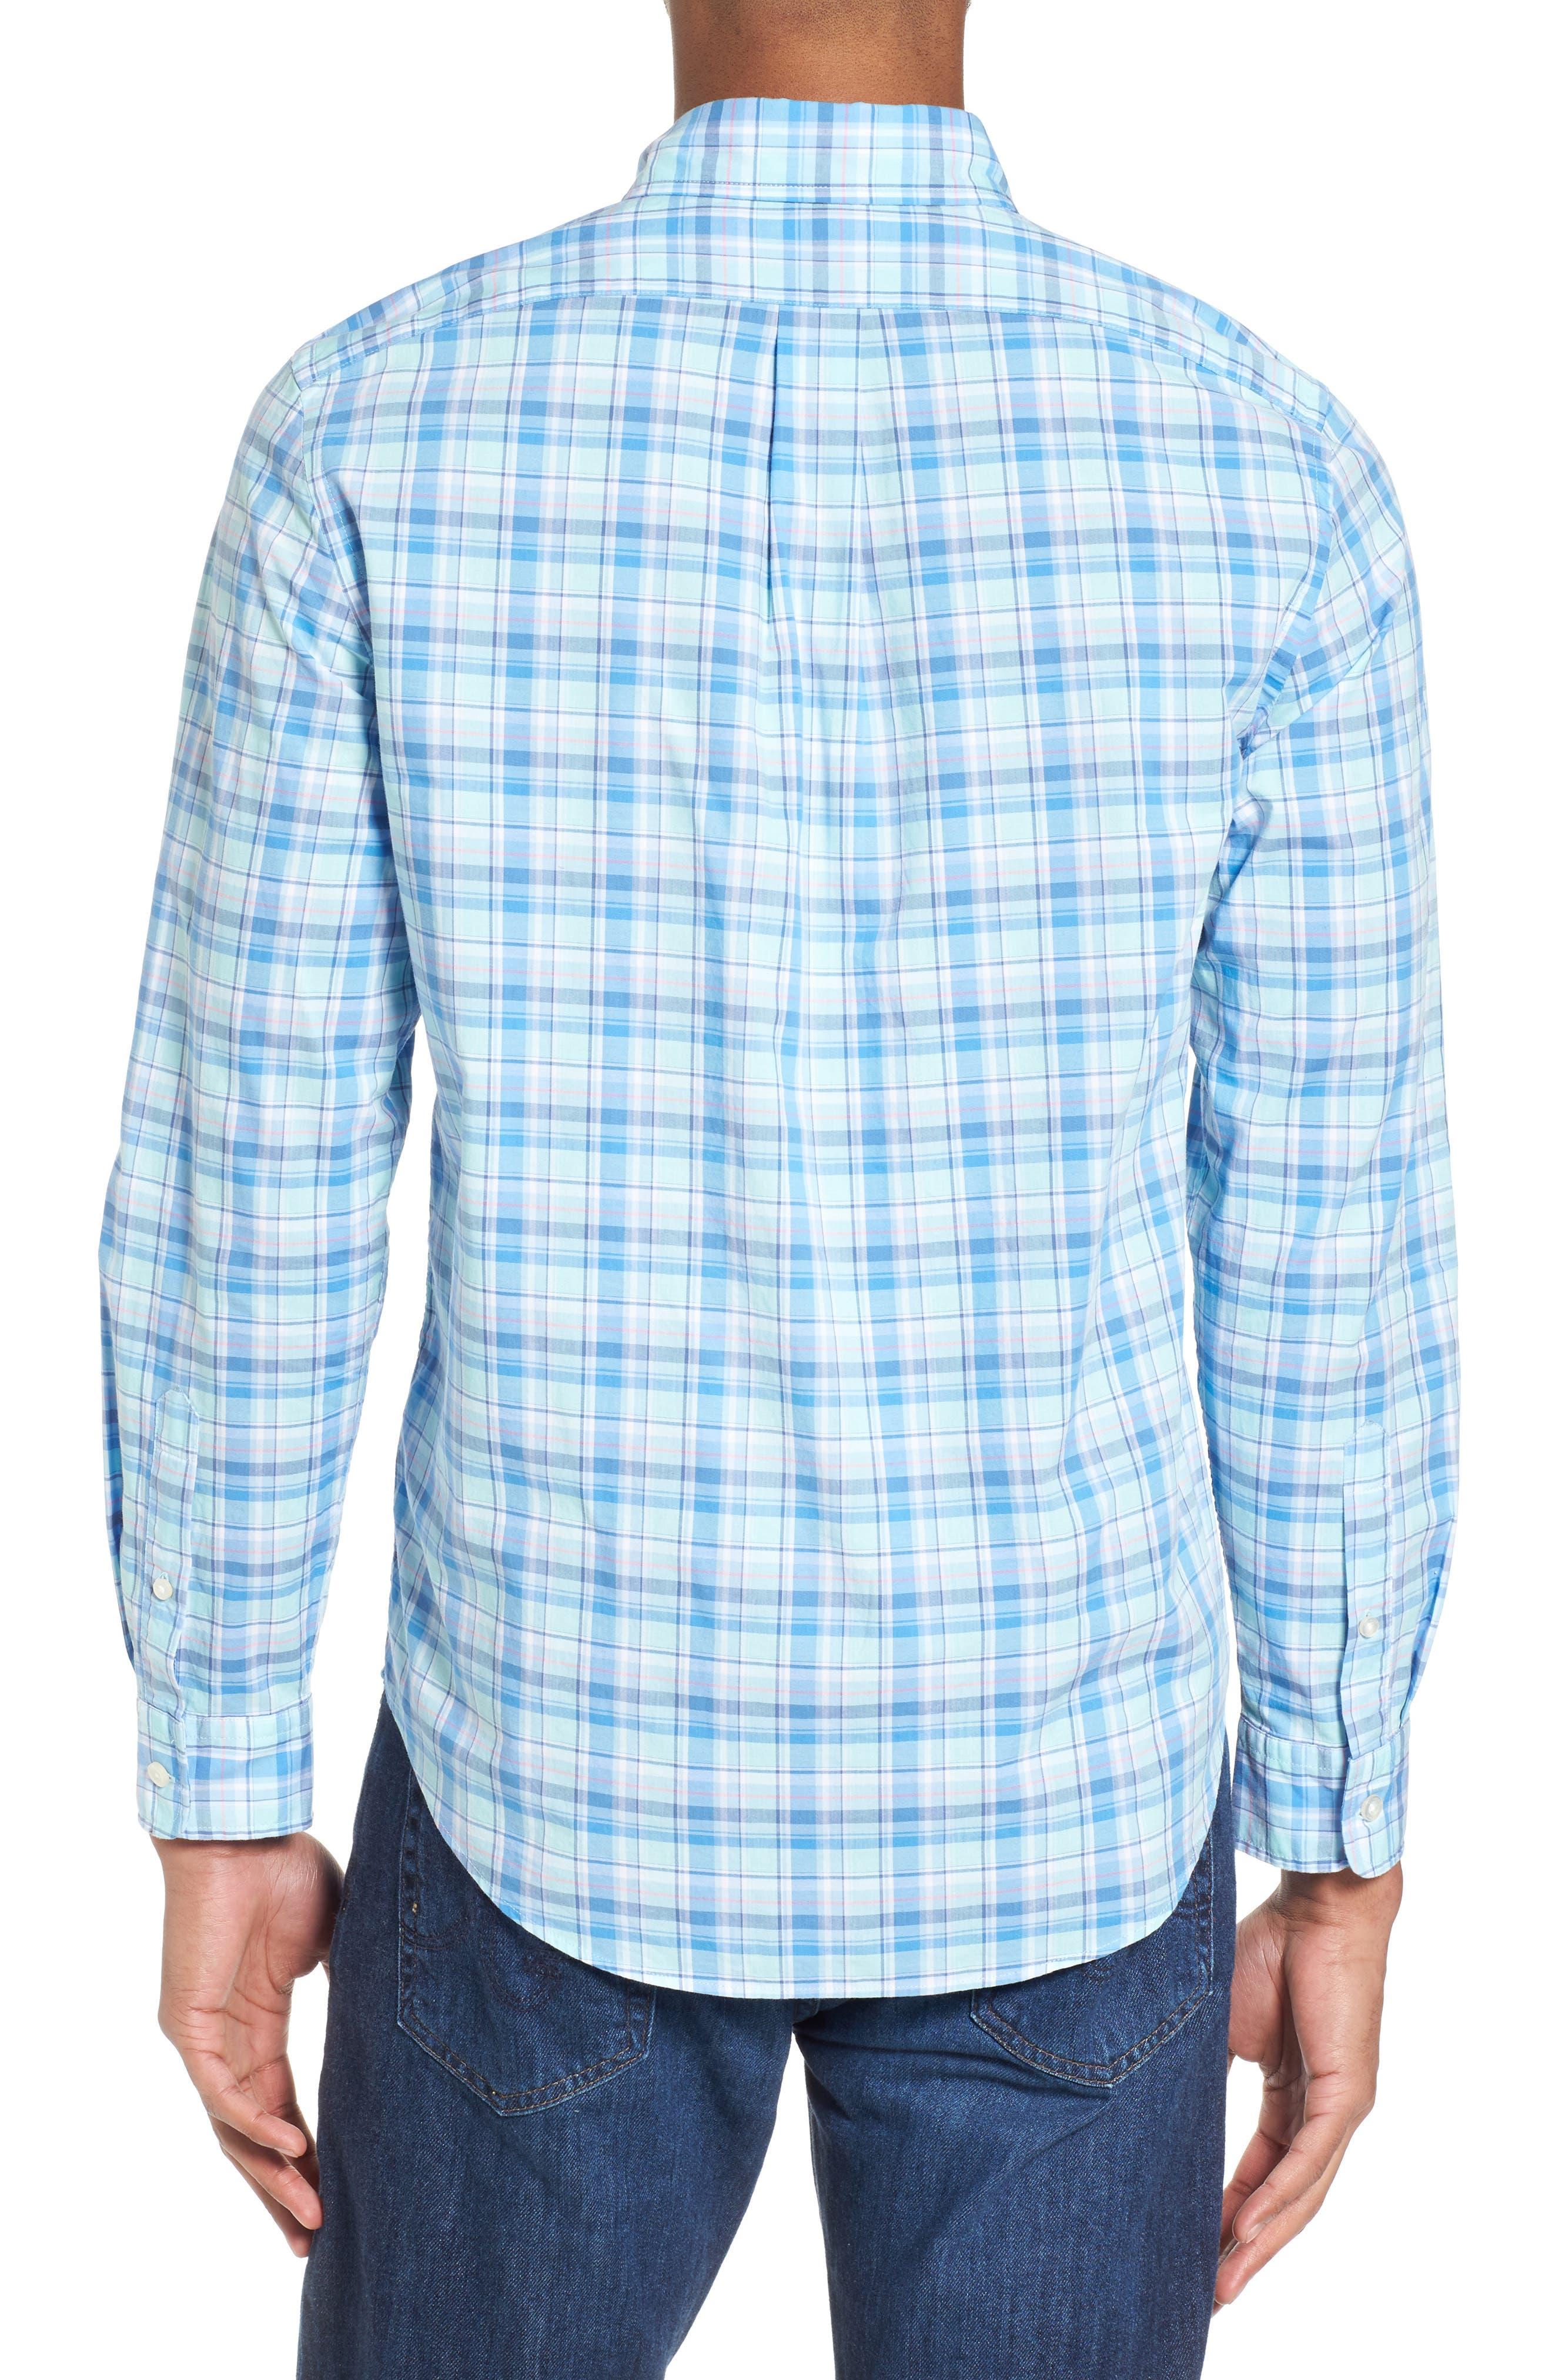 Murray Pine Island Slim Fit Plaid Sport Shirt,                             Alternate thumbnail 2, color,                             Sea Splash